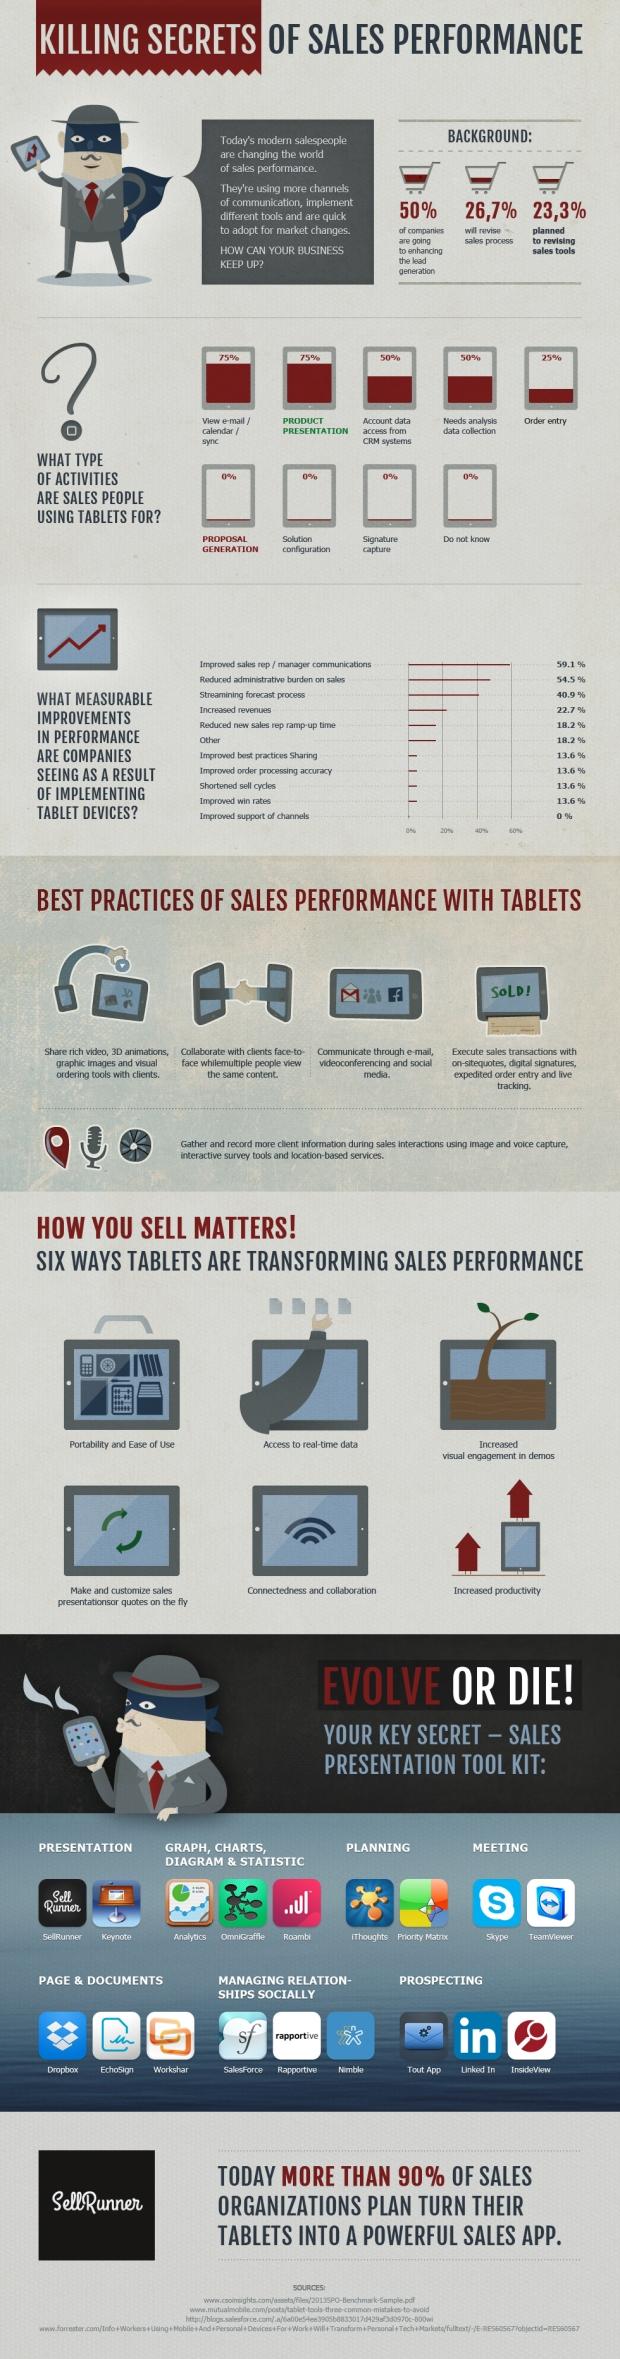 Killing Secret Of Sales Performance